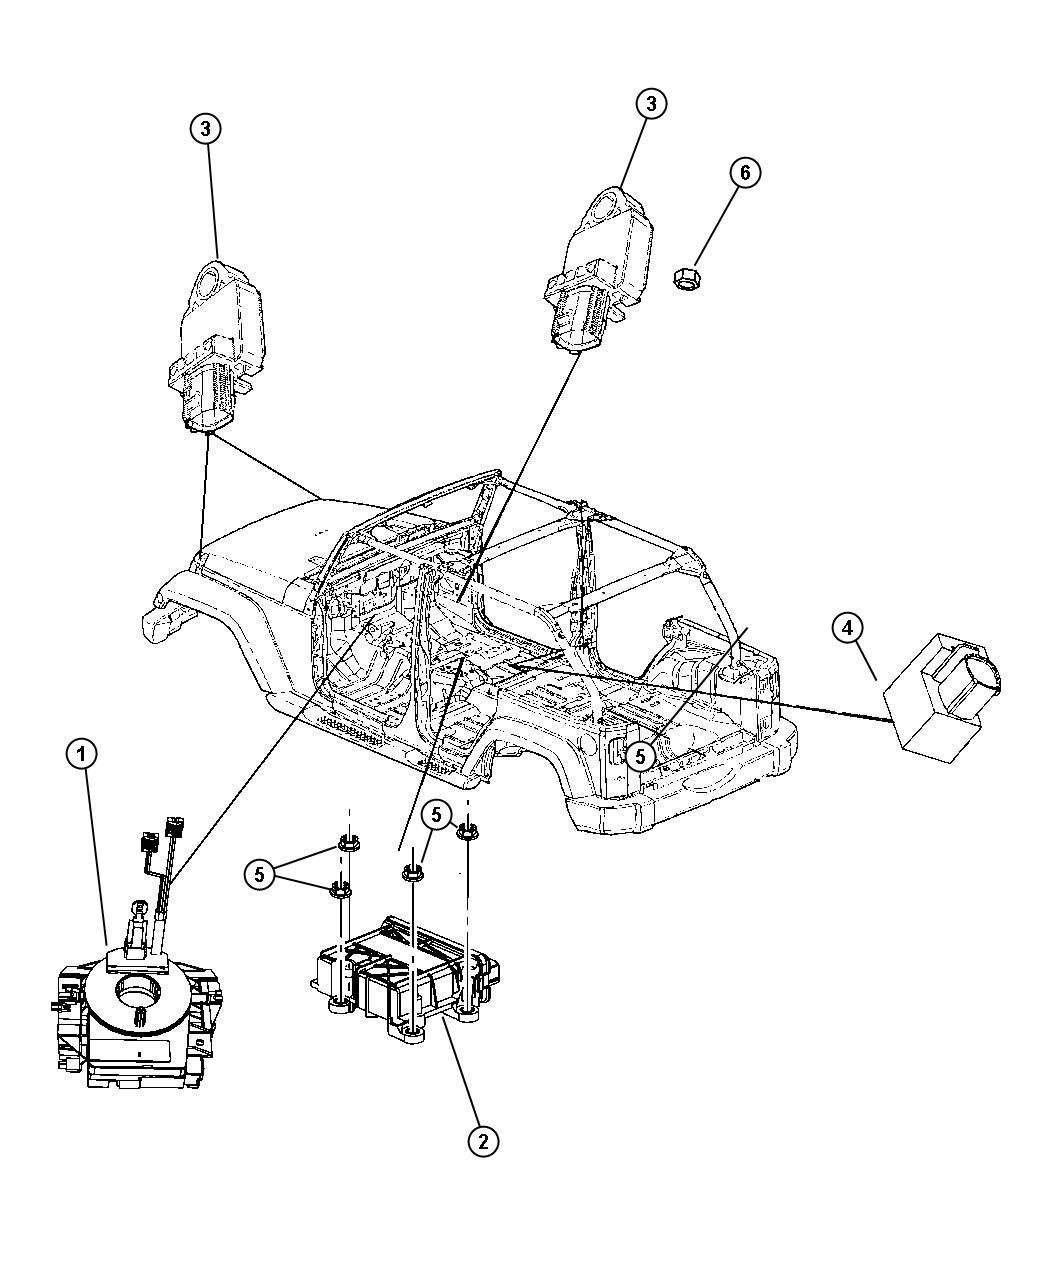 s10 fog light wiring diagram nilza net on simple airbag wiring diagram